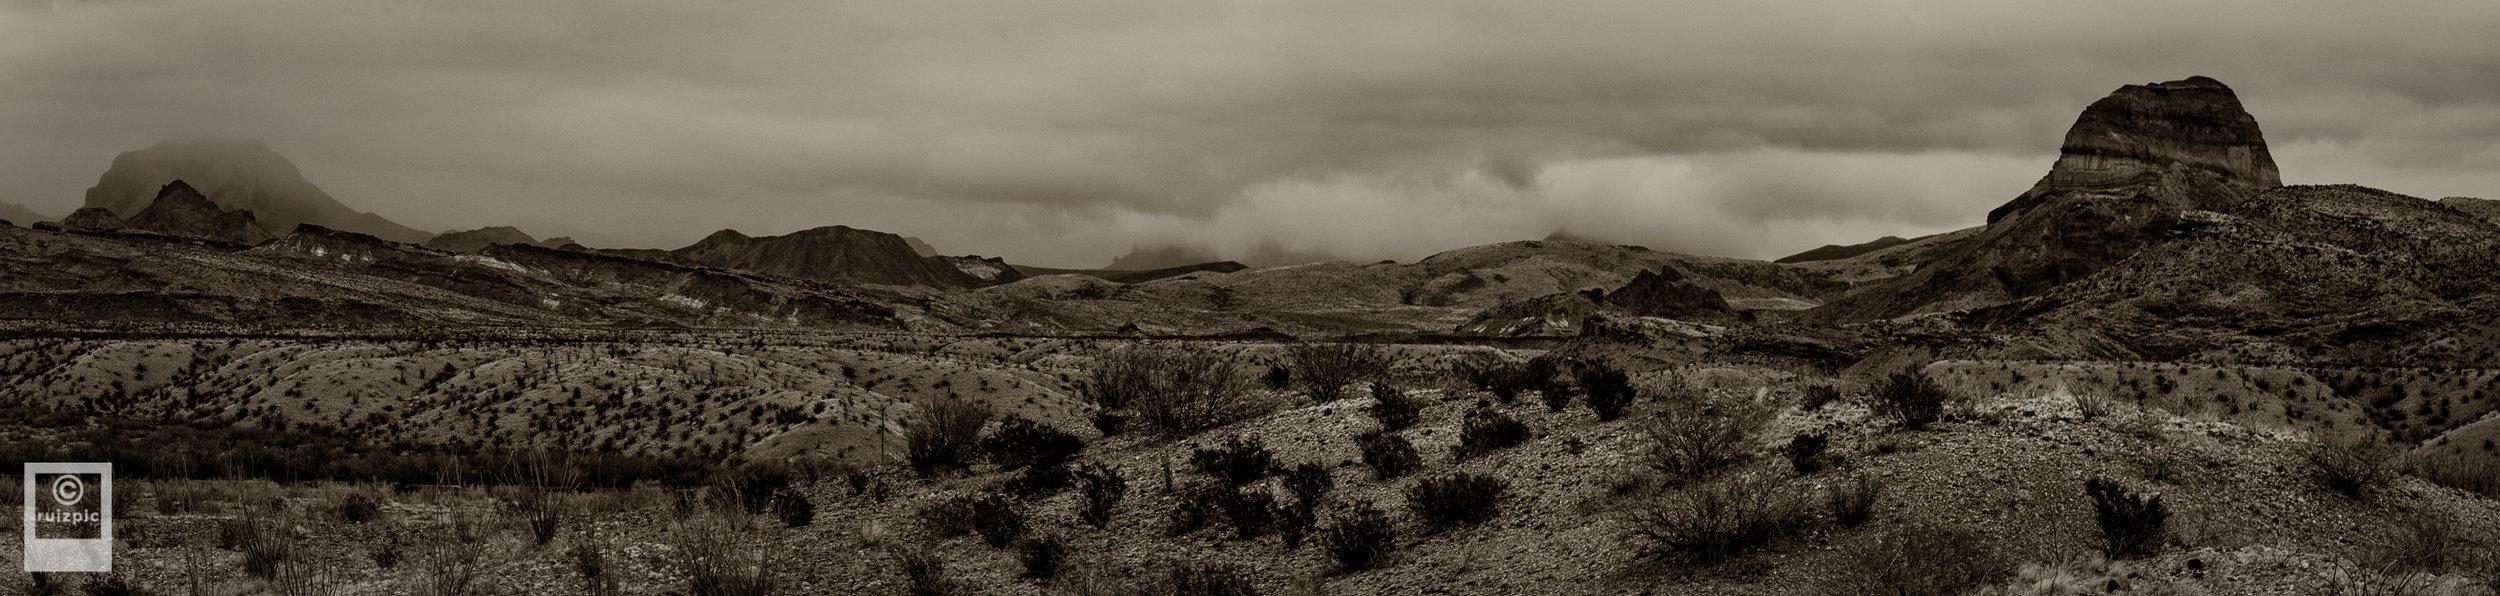 Justin Ruiz Photography_DSF0888-Pano-Edit-2-2.jpg